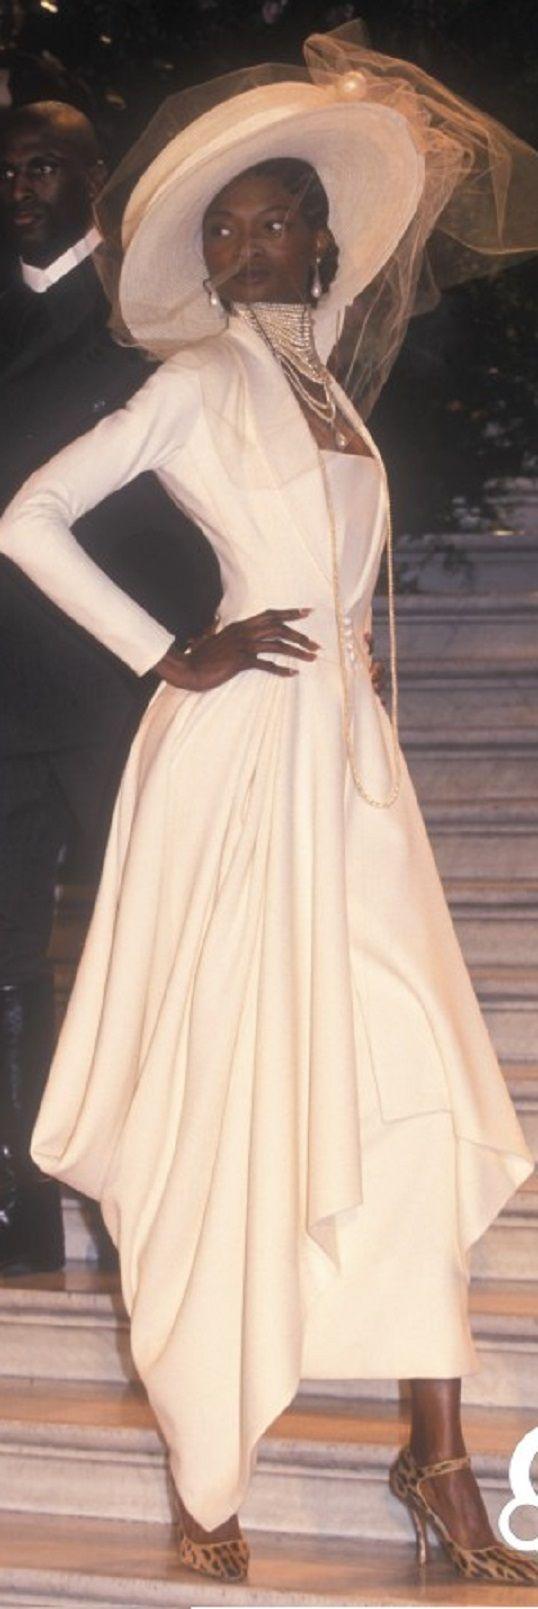 Dior Haute Couture - spring summer 1998 - John Galliano                                                                                                                                                                                 More